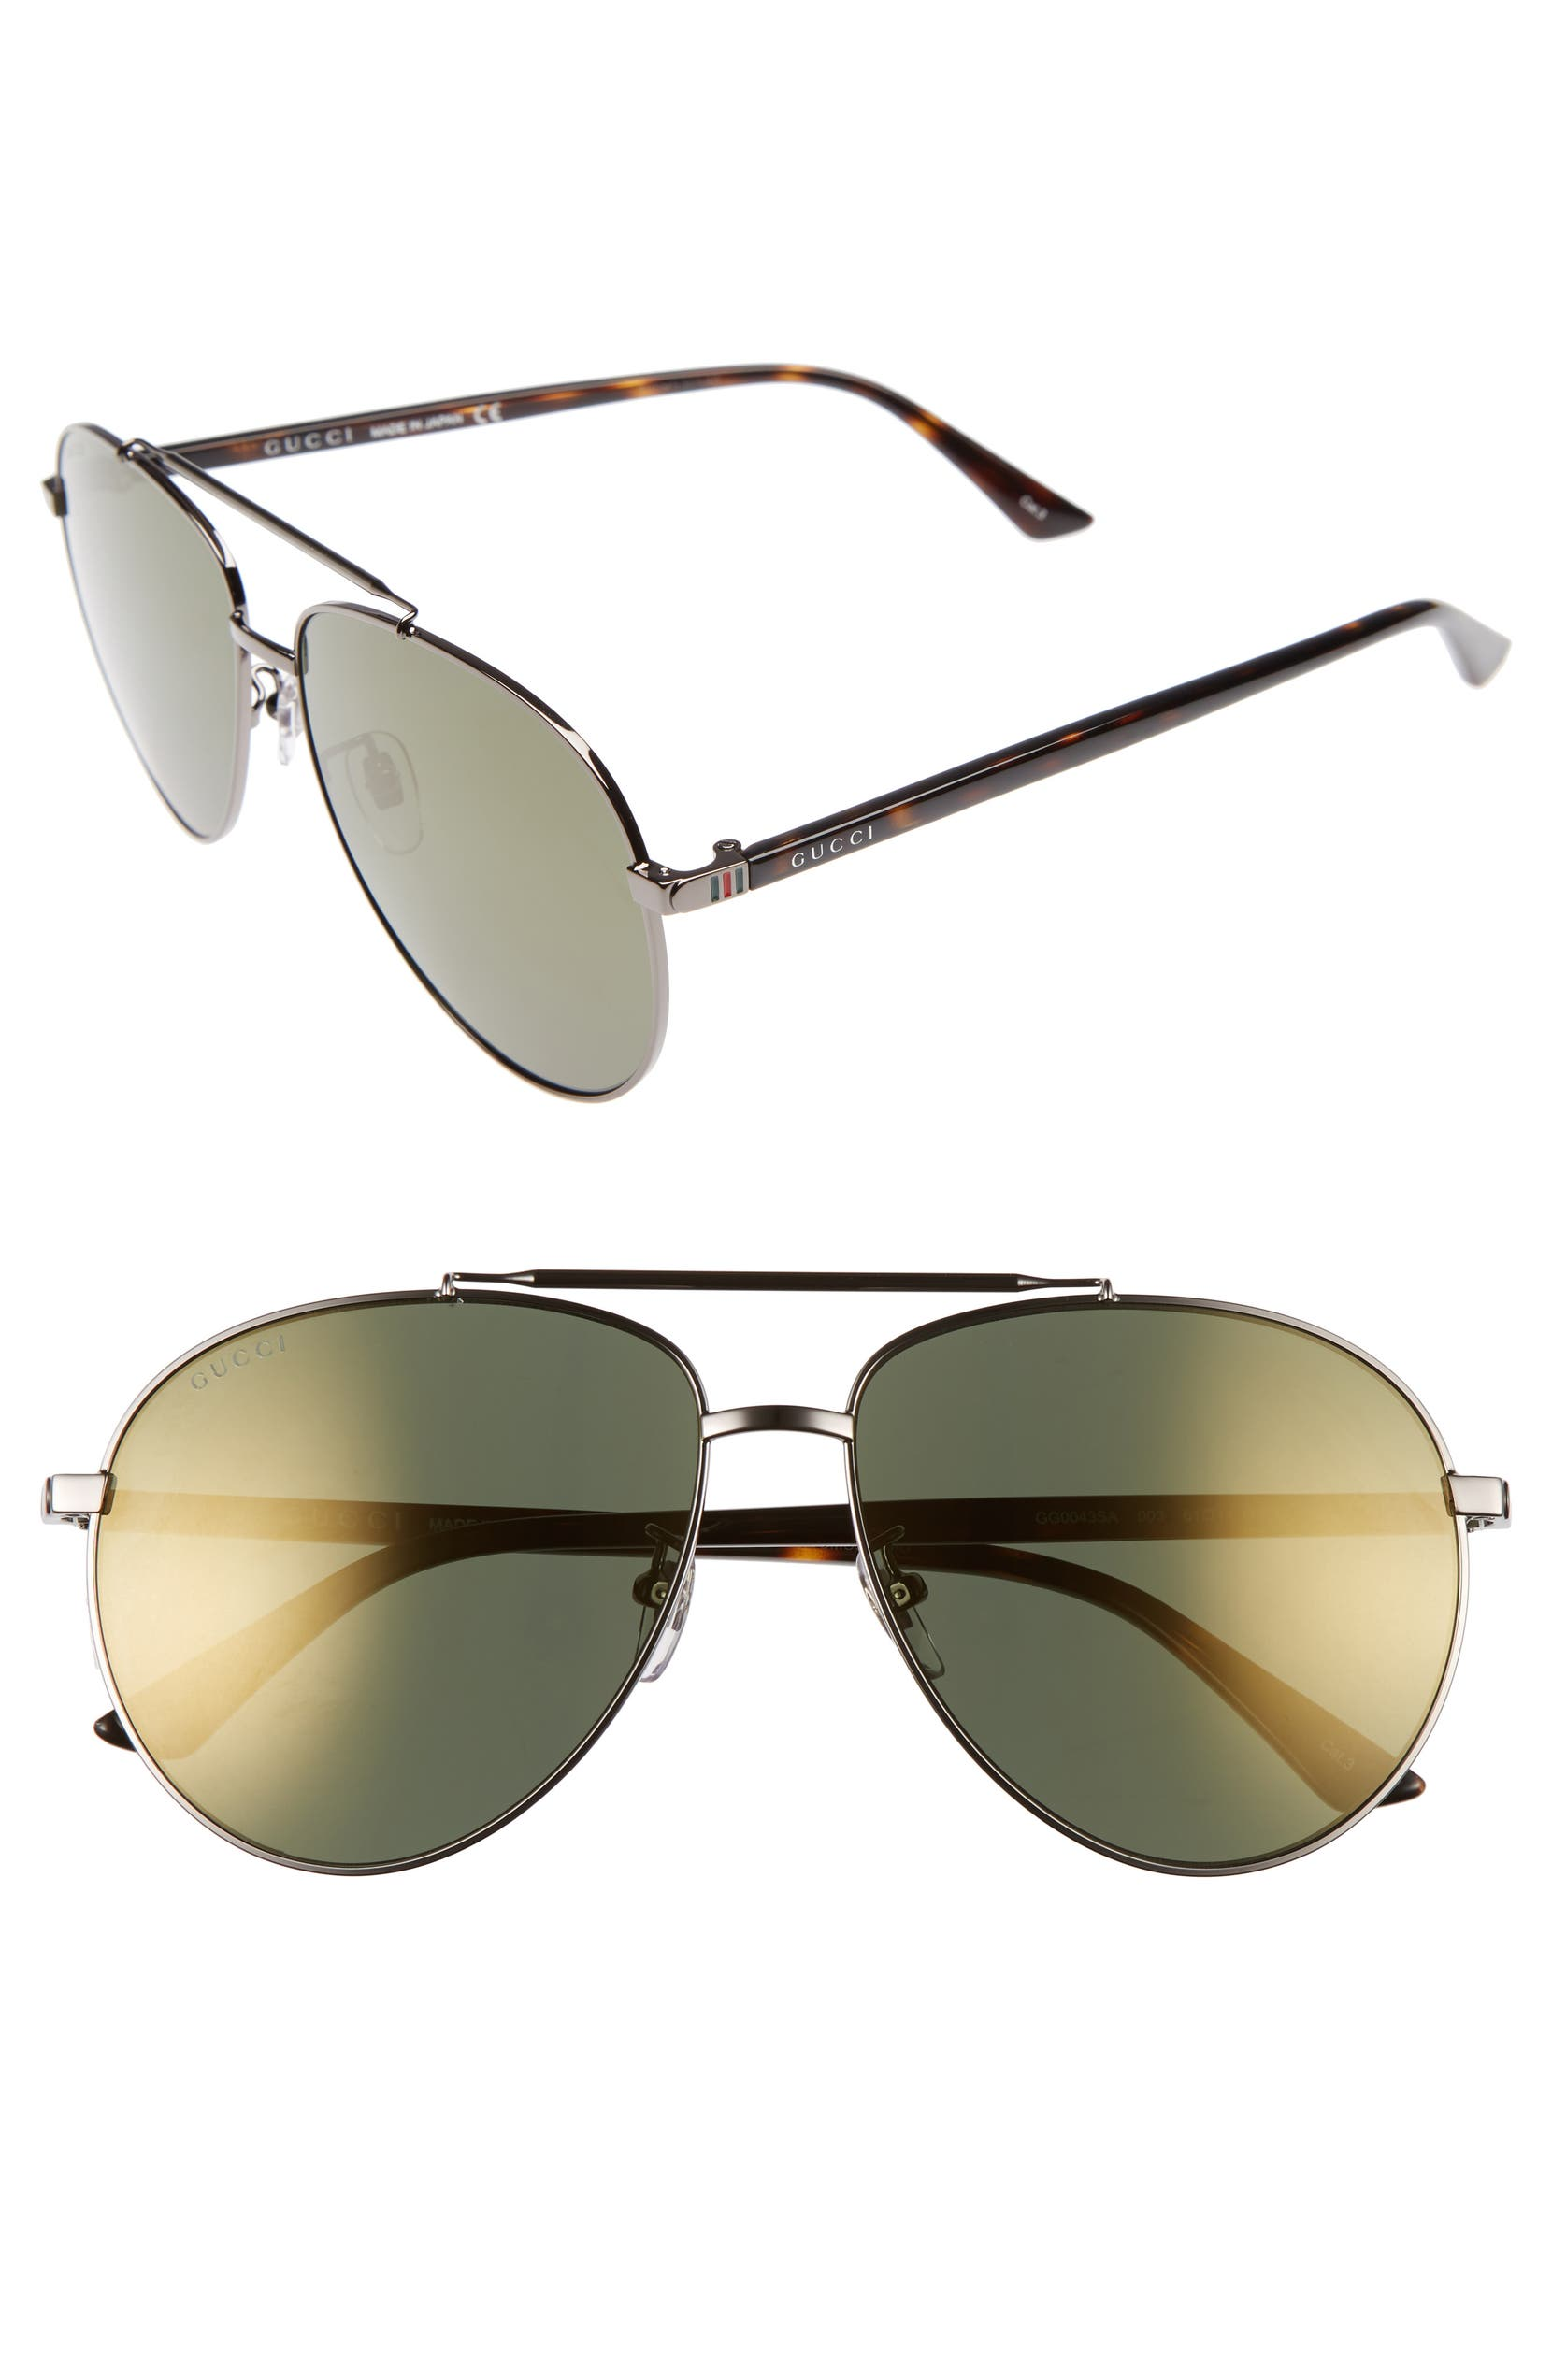 c4ef167c291 Gucci Retro Web 61mm Aviator Sunglasses